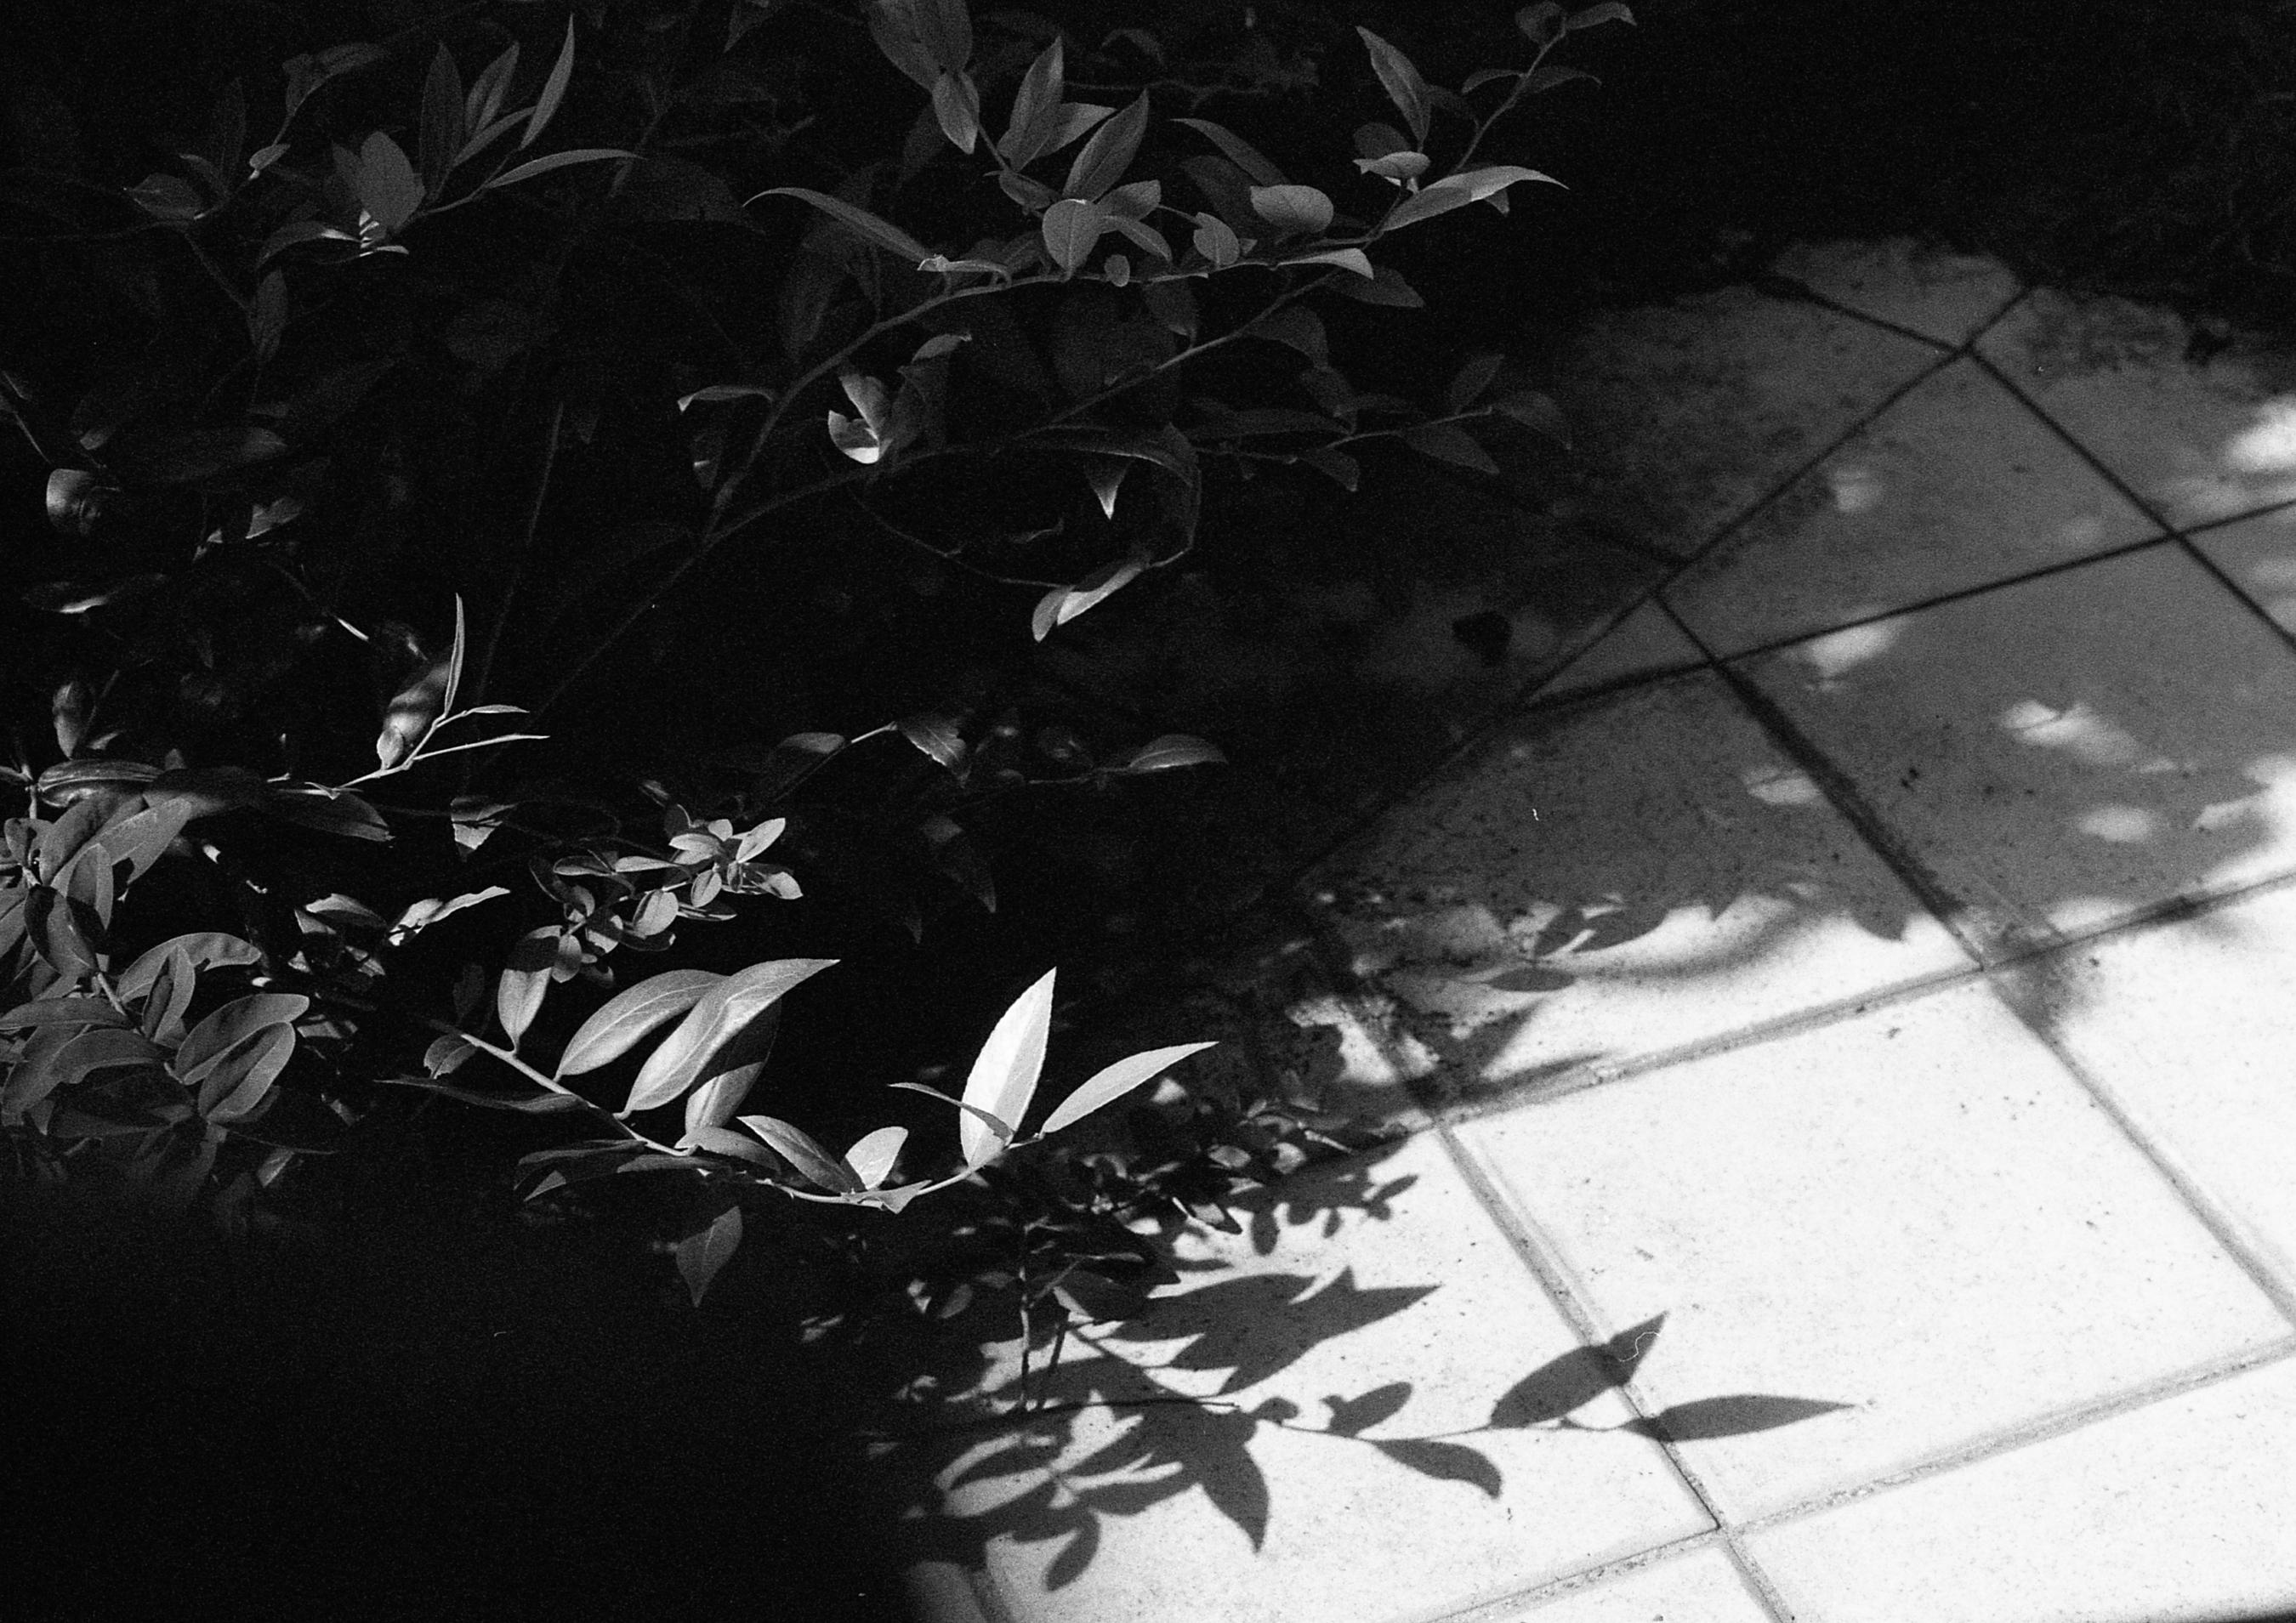 f:id:aoyama-takuro:20180727212713j:plain